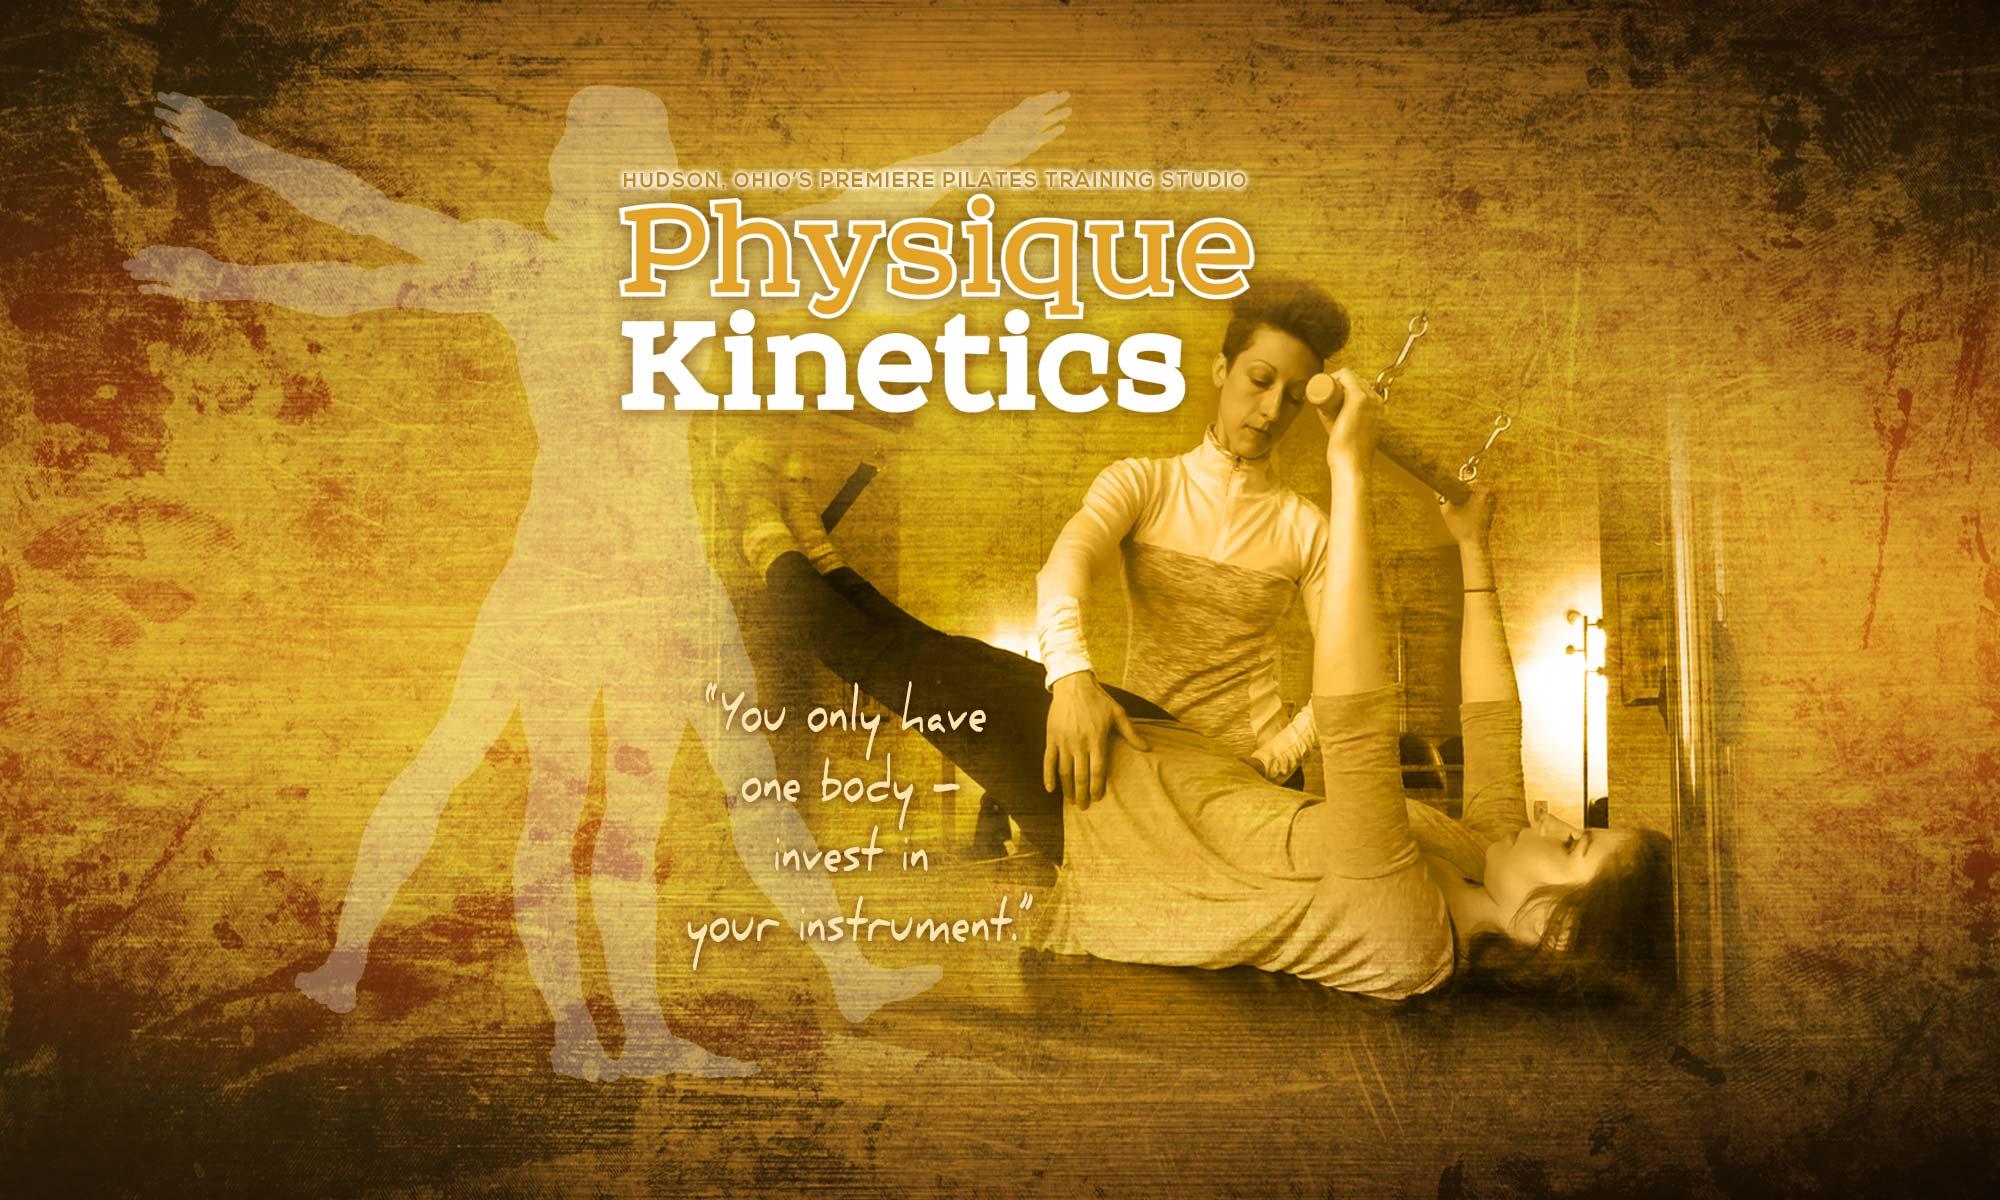 Physique Kinetics